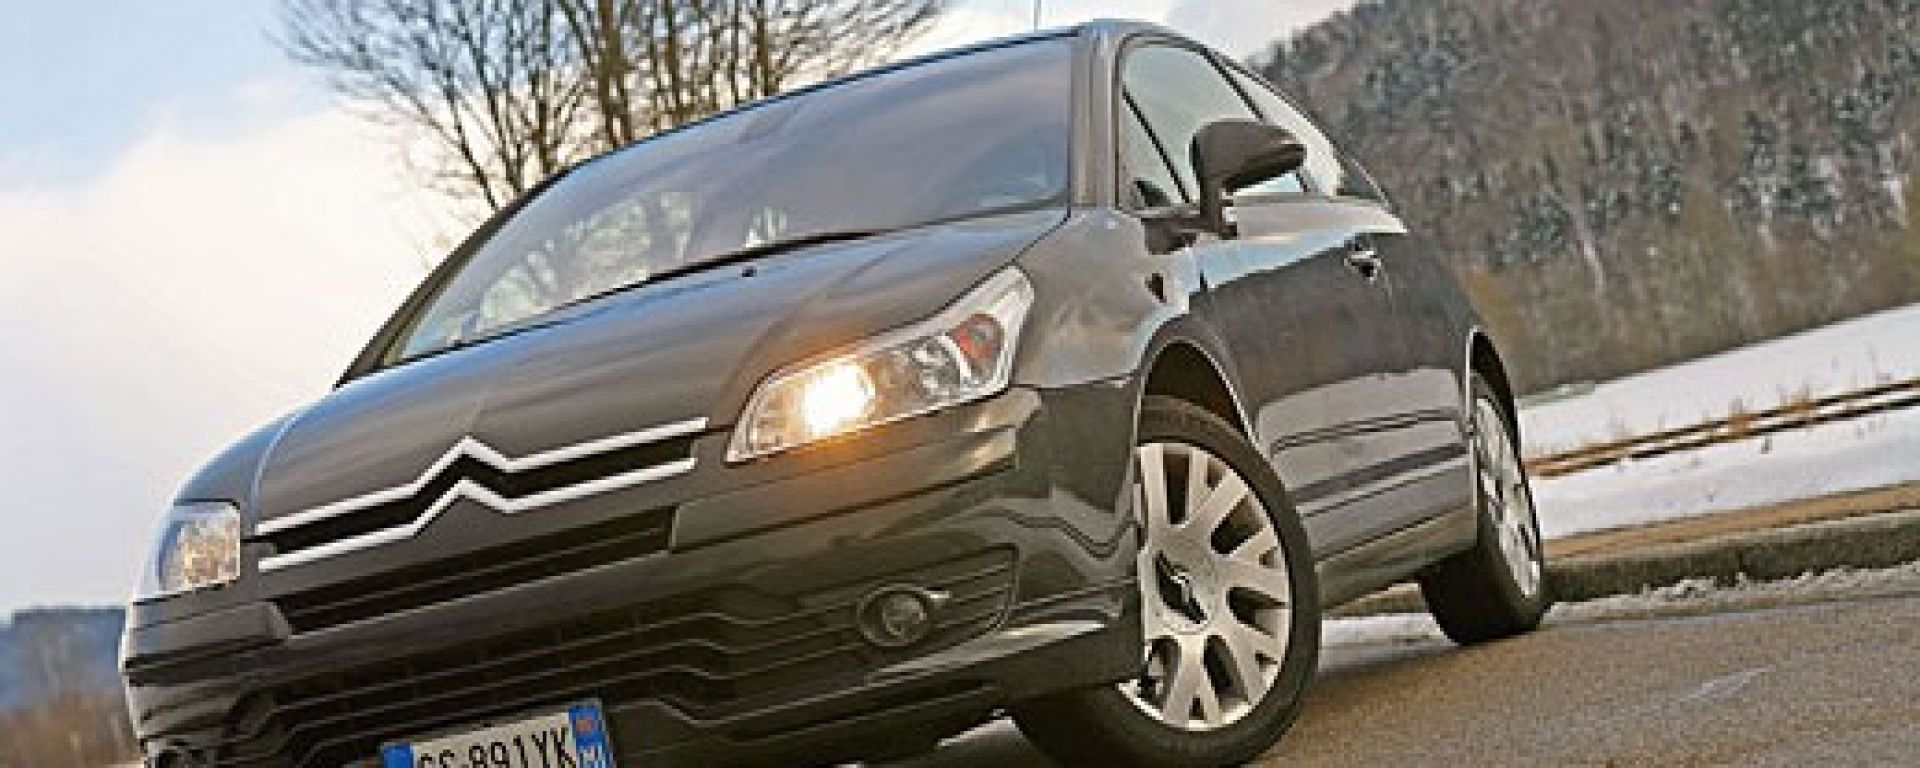 Citroën C4 Coupé 1.6 HDI